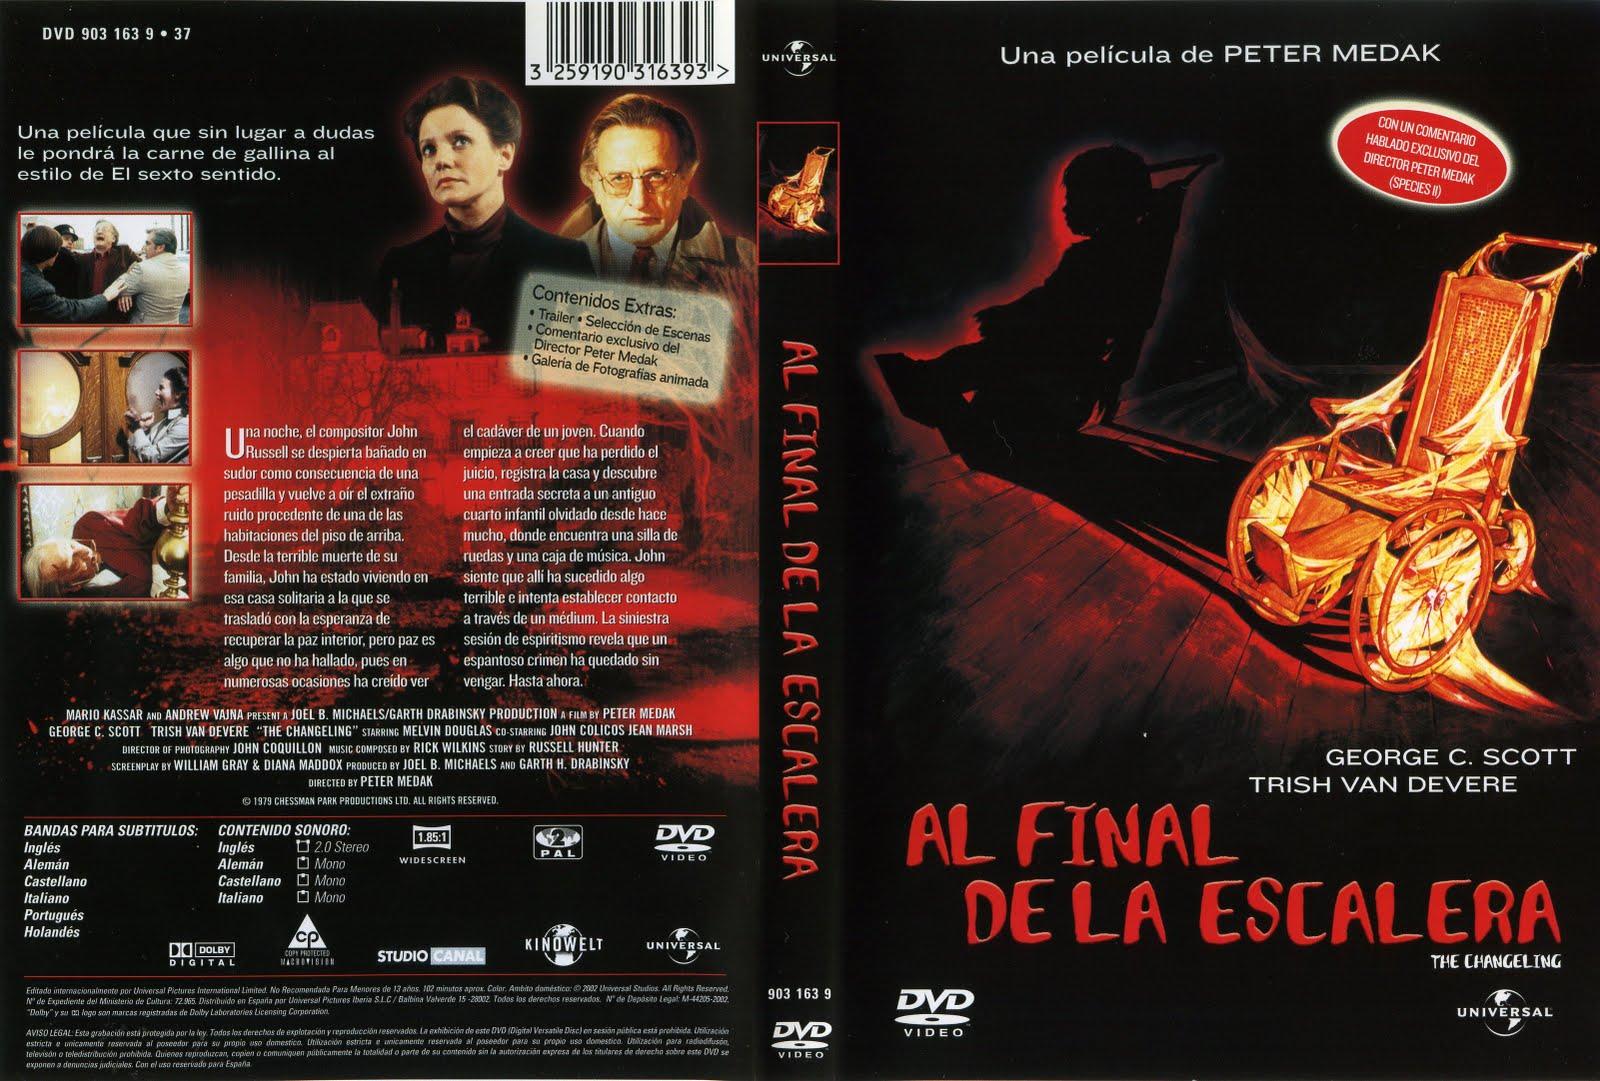 http://4.bp.blogspot.com/_NeMSesWOqnY/TA5_GqydSXI/AAAAAAAABqI/xvc95NTtXDk/s1600/AL+FINAL+DE+LA+ESCALERA.jpg